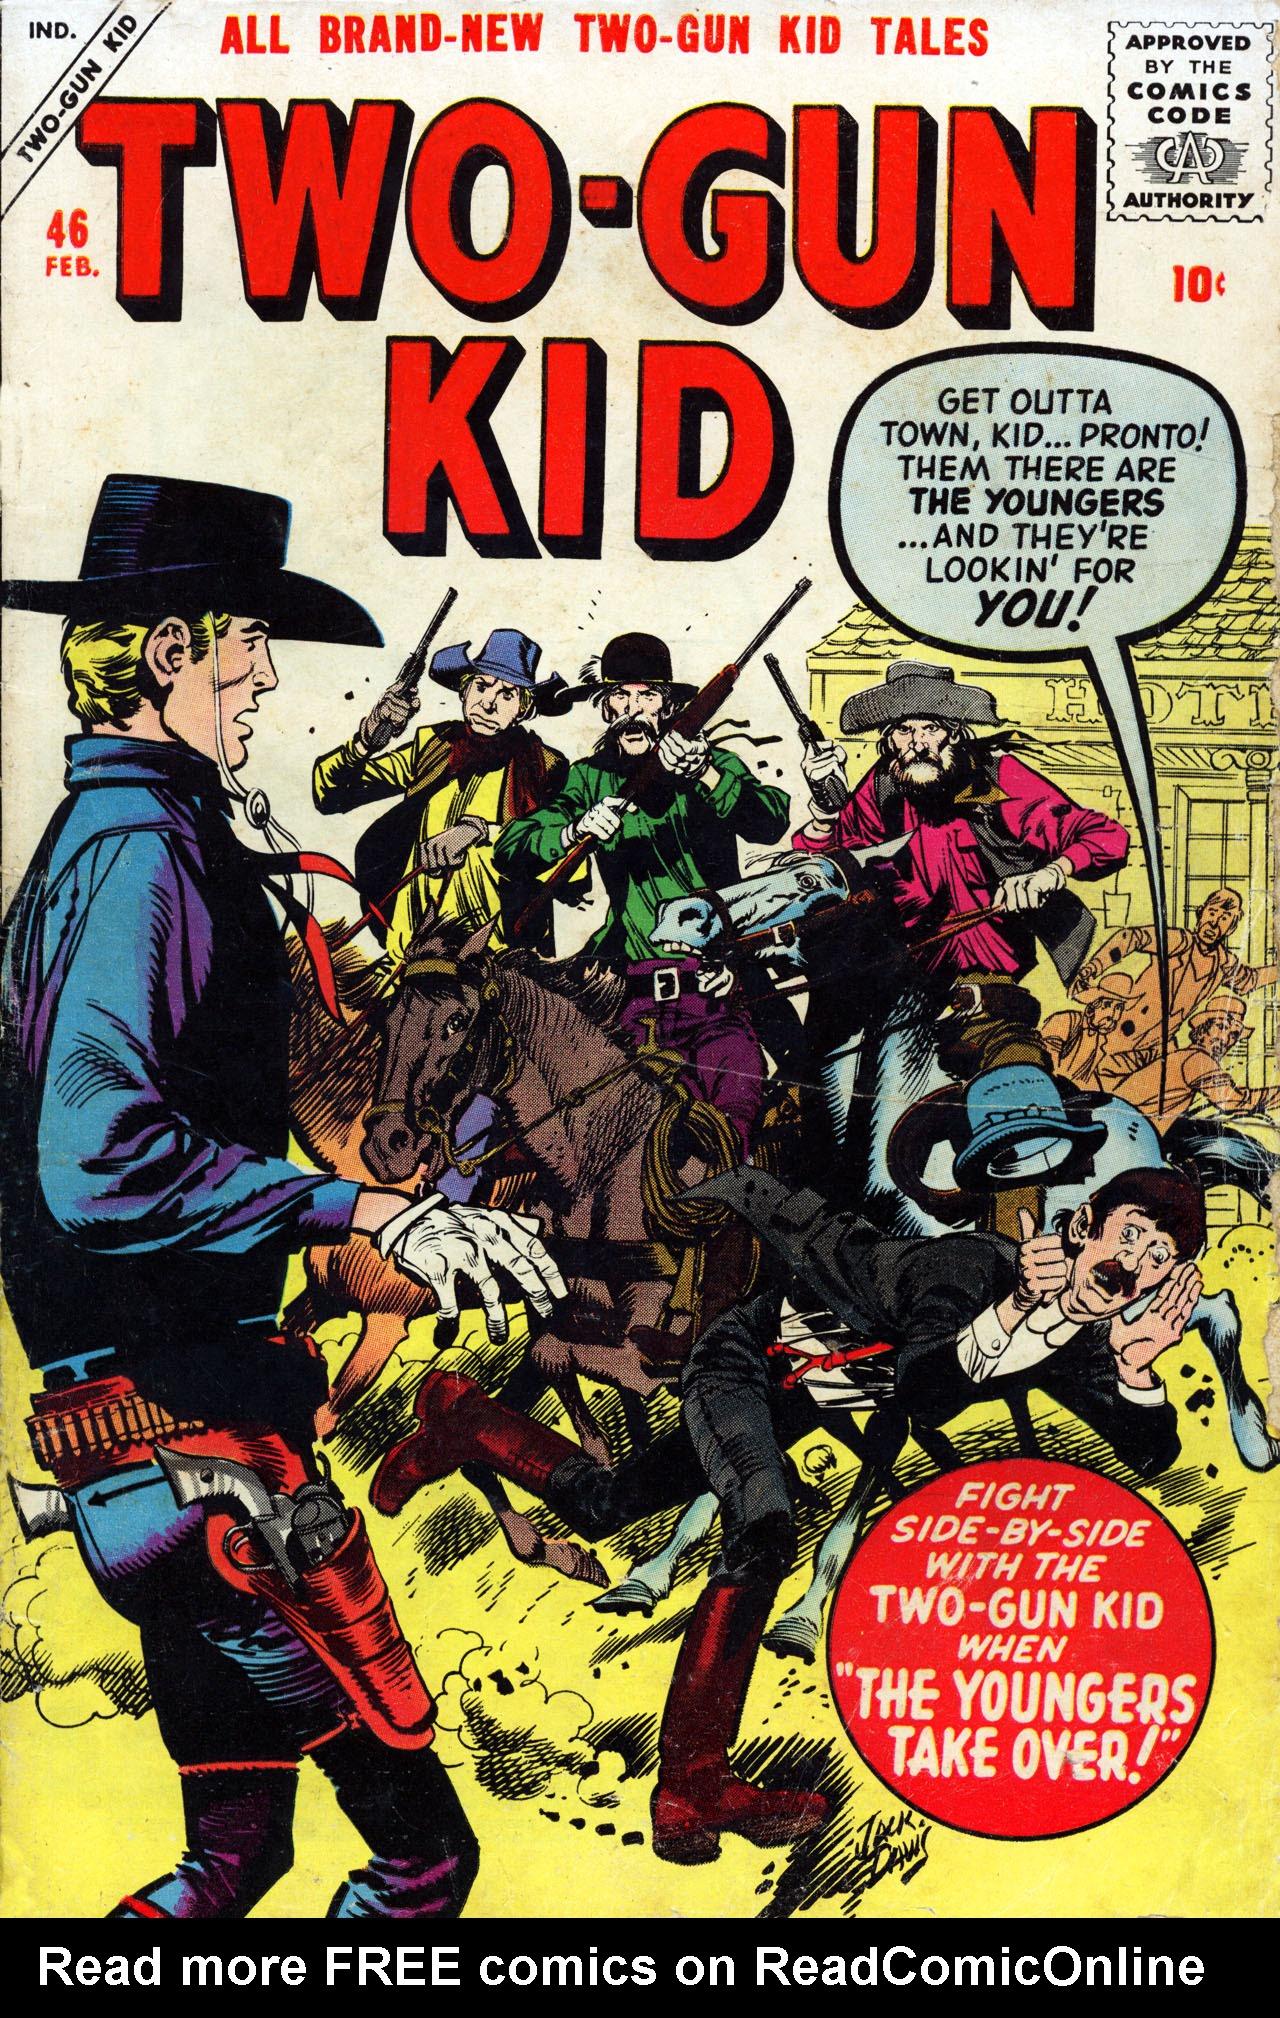 Read online Two-Gun Kid comic -  Issue #46 - 1